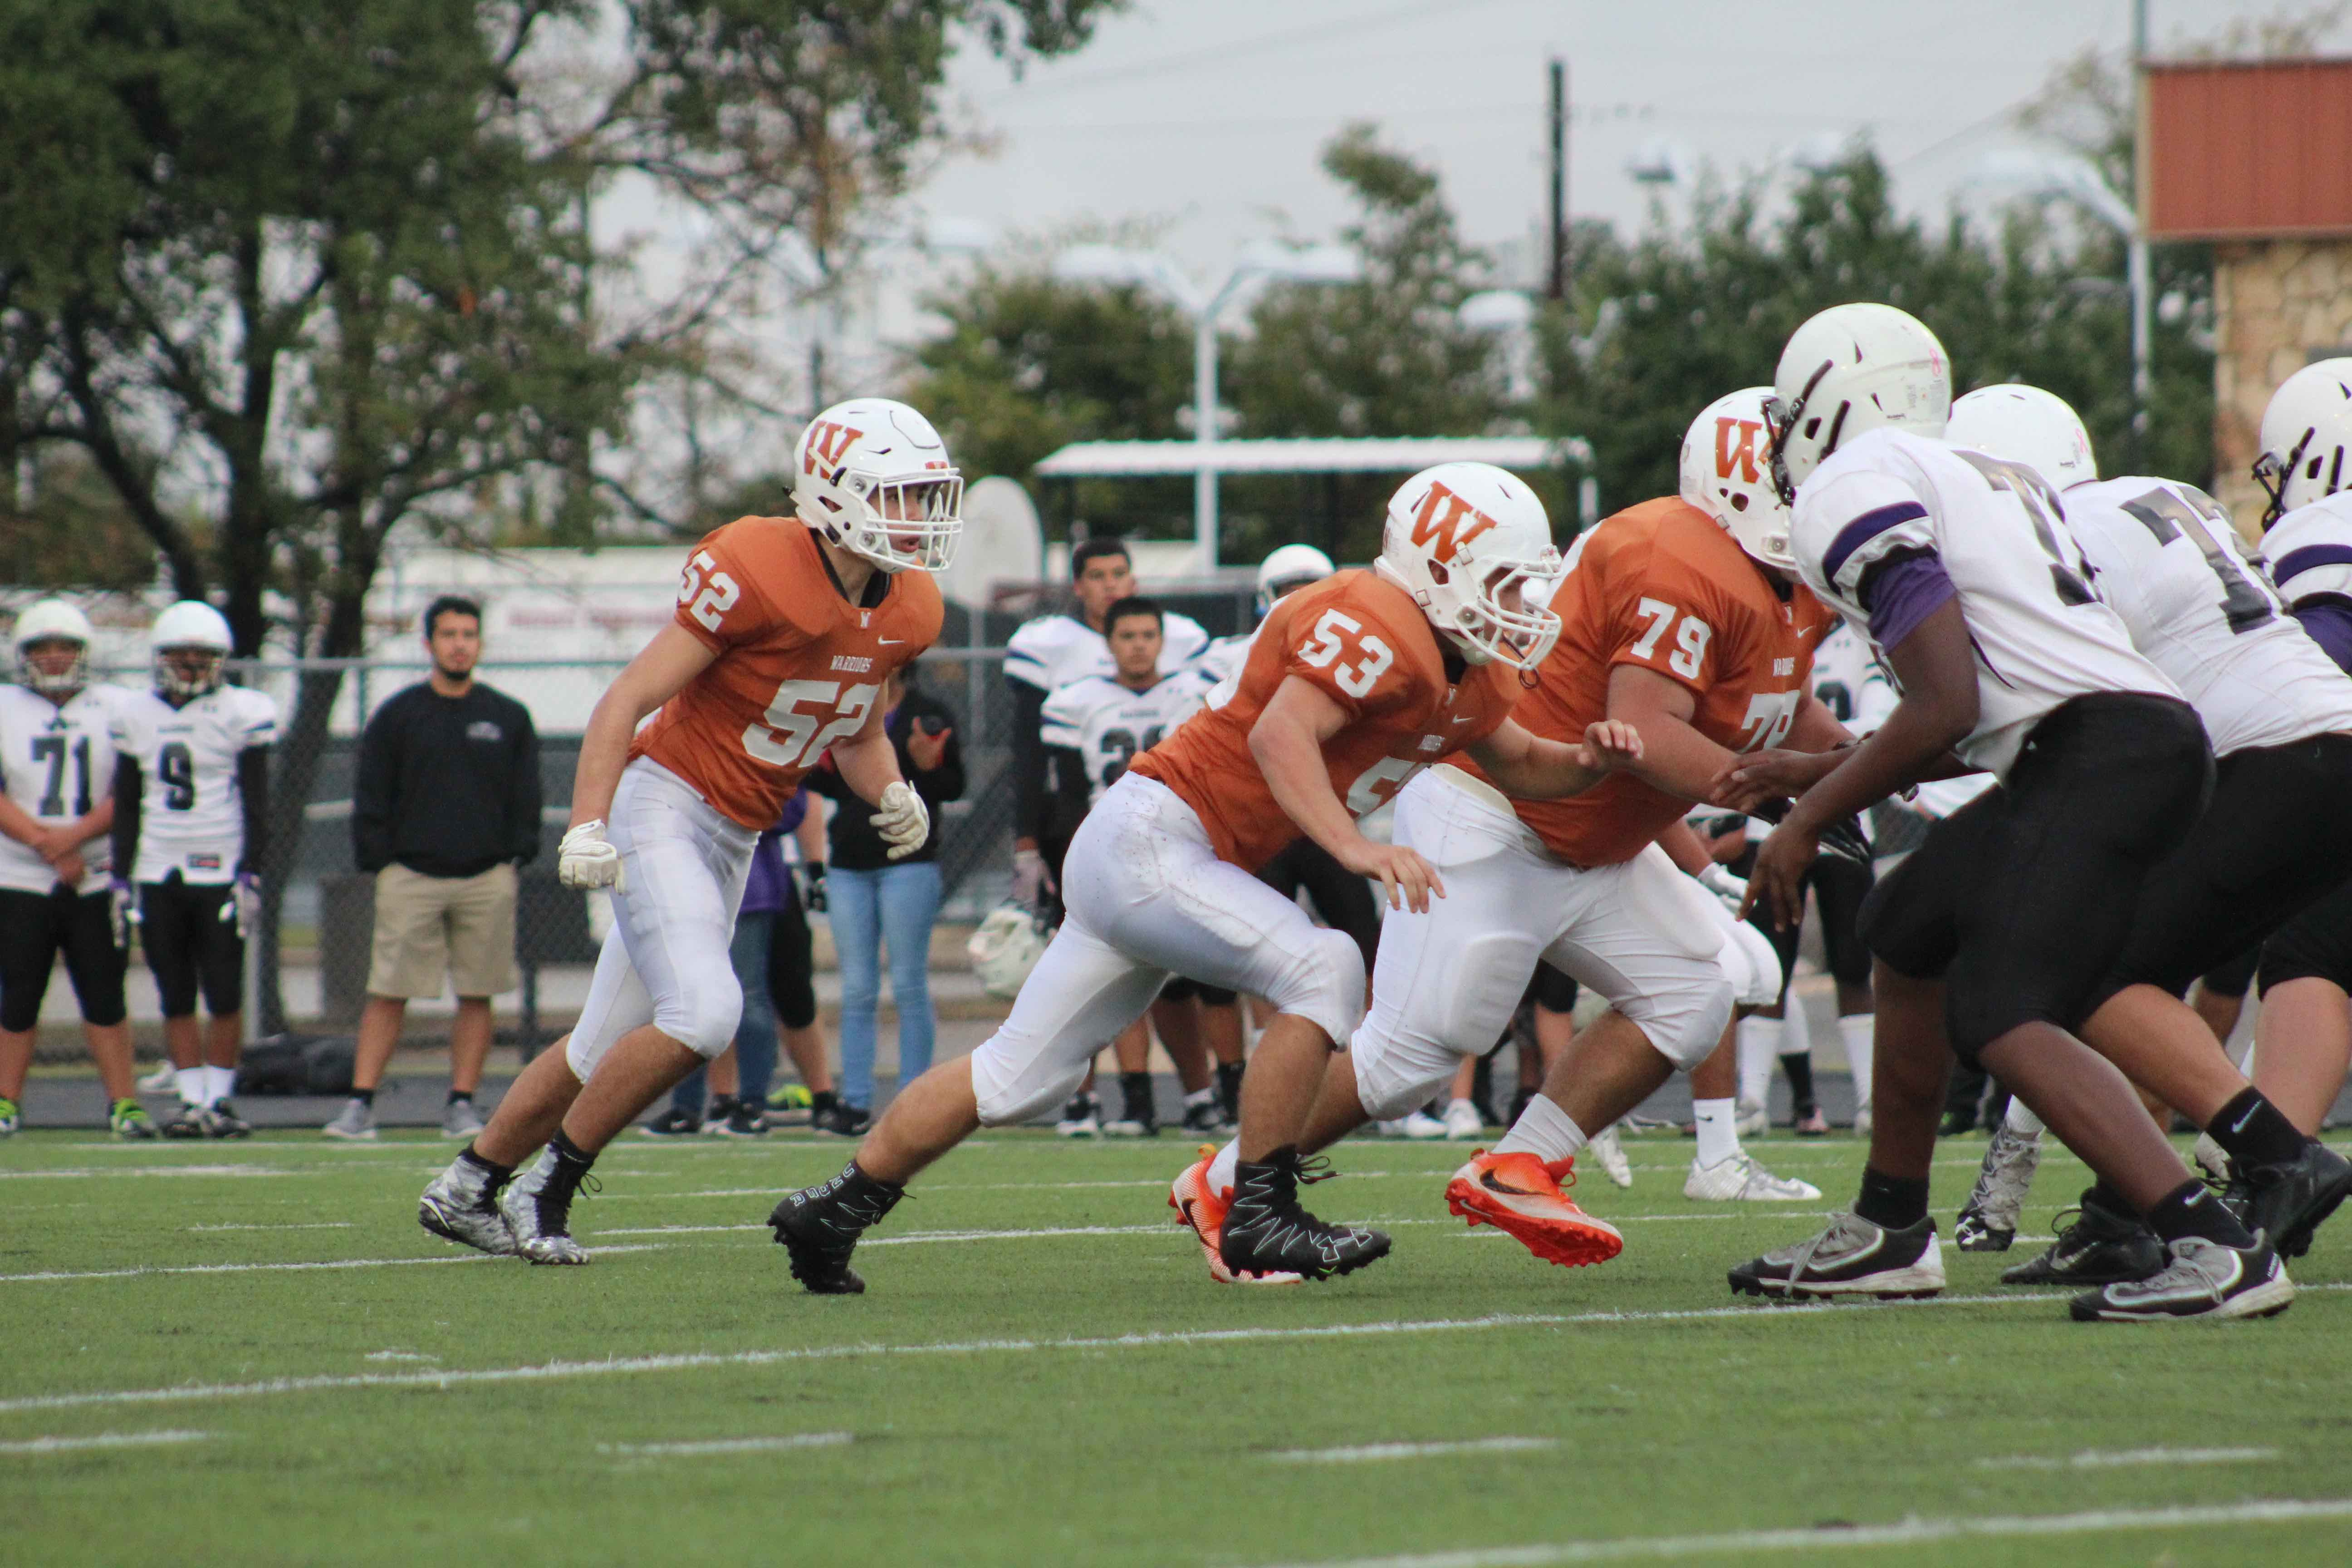 JV+Football+Falls+to+Cedar+Ridge+Raiders